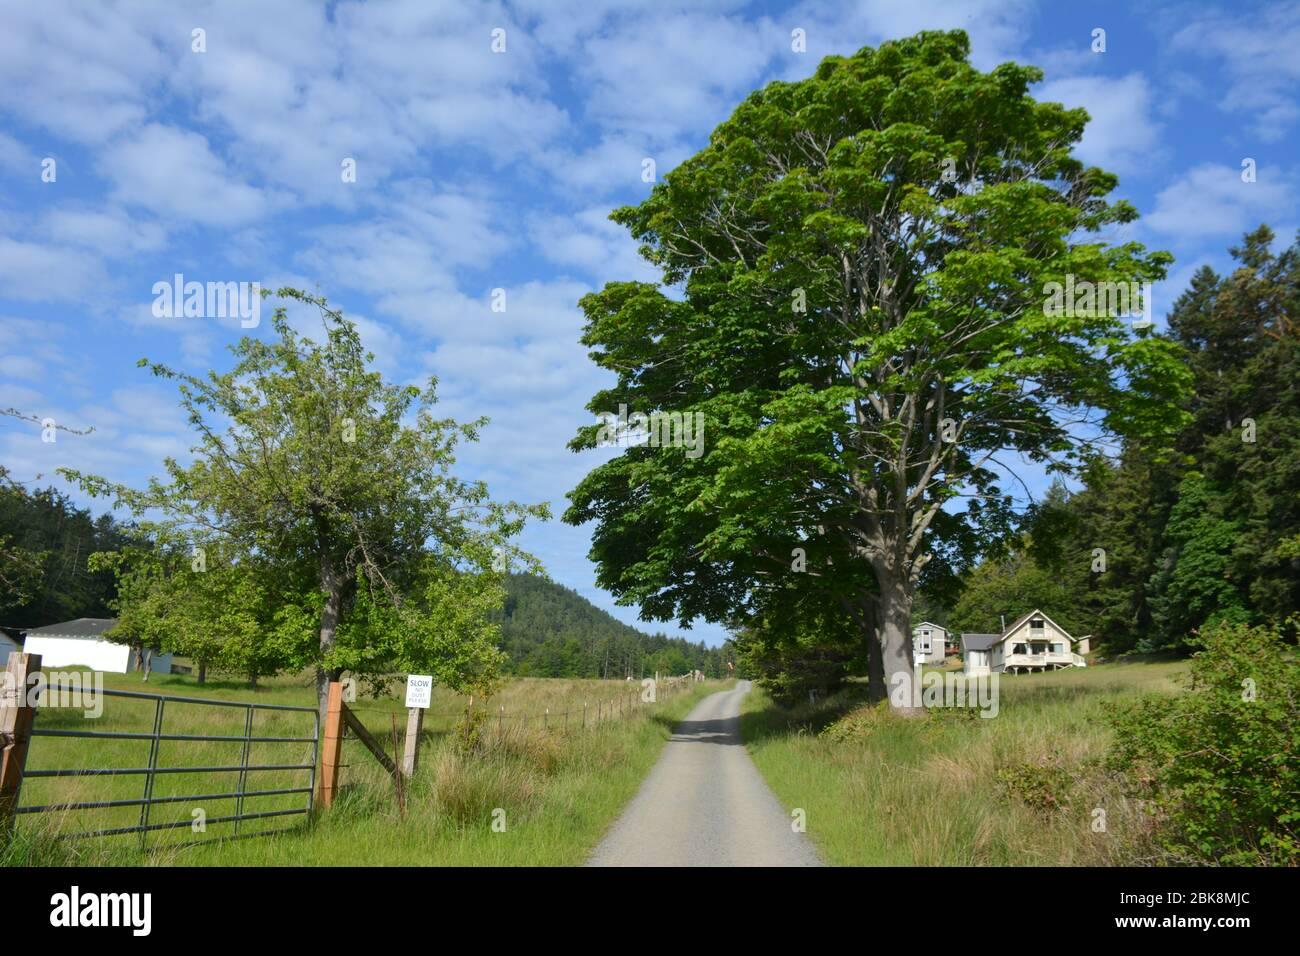 The settlement of Prevost on Stuart Island in the San Juan Islands, Washington State, USA. Stock Photo